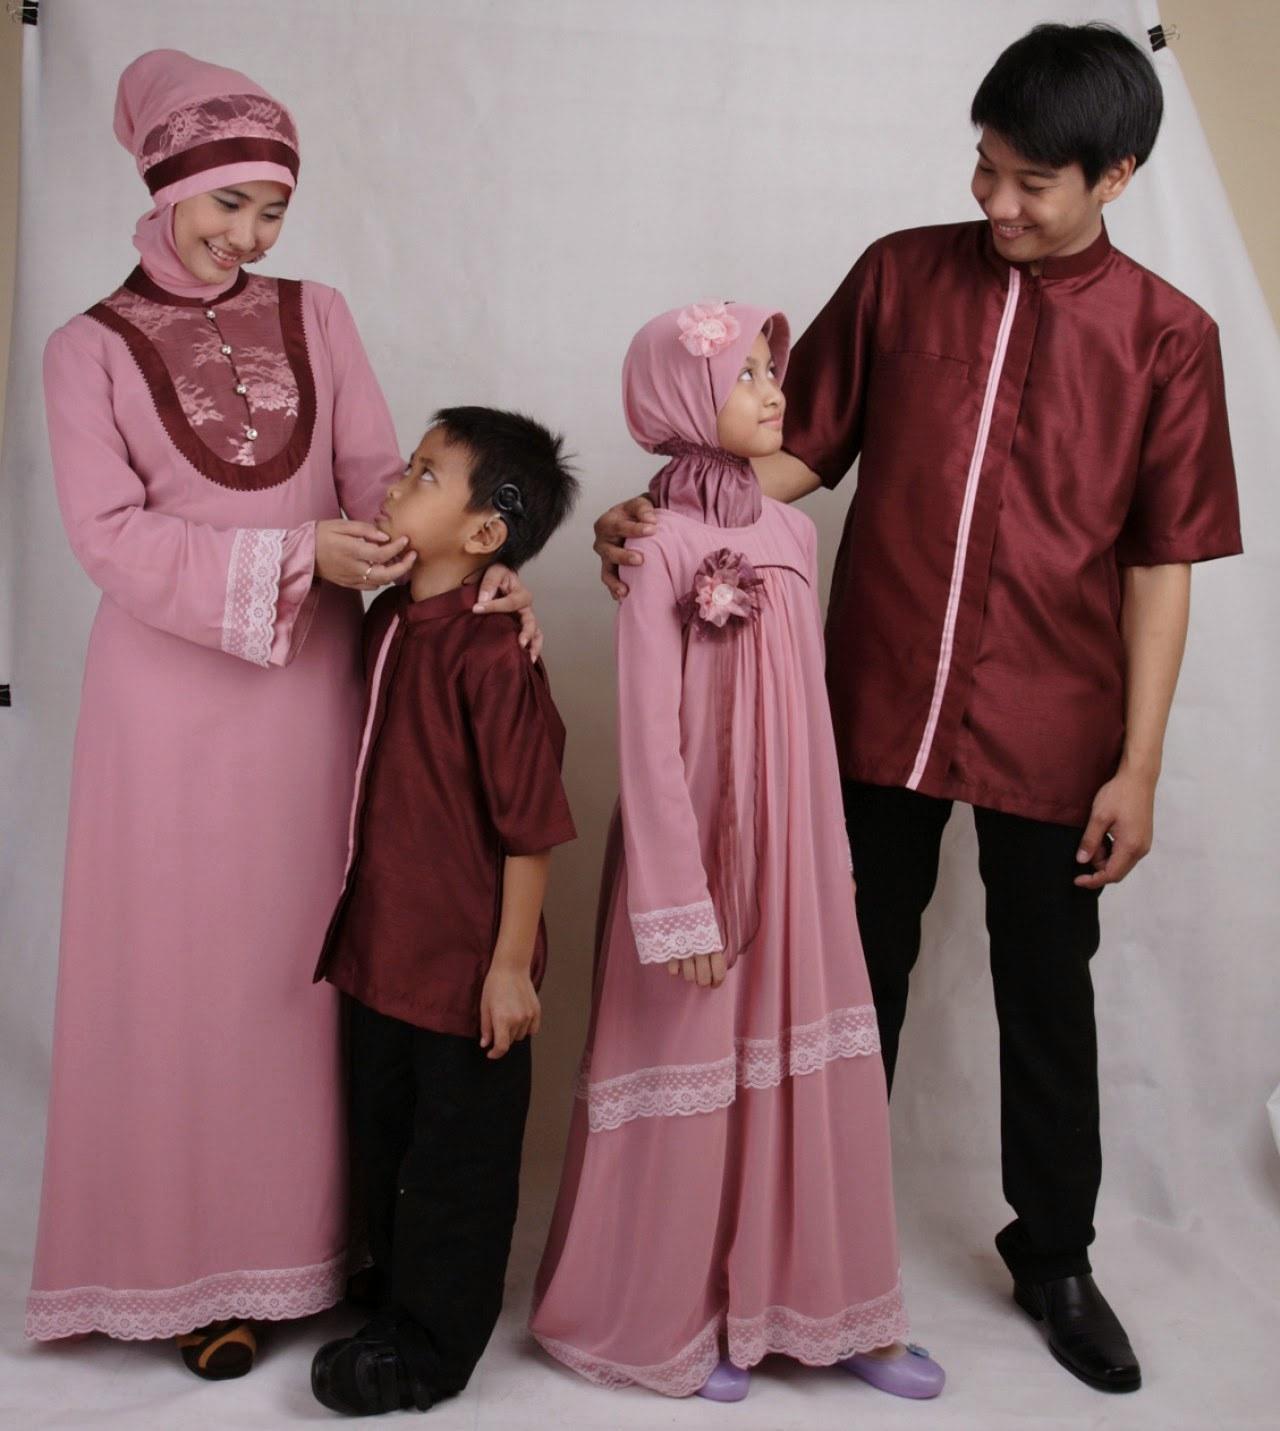 Inspirasi Model Baju Lebaran Untuk Keluarga Mndw Model Baju Keluarga Muslim Seragam Kembar Terbaru 2018